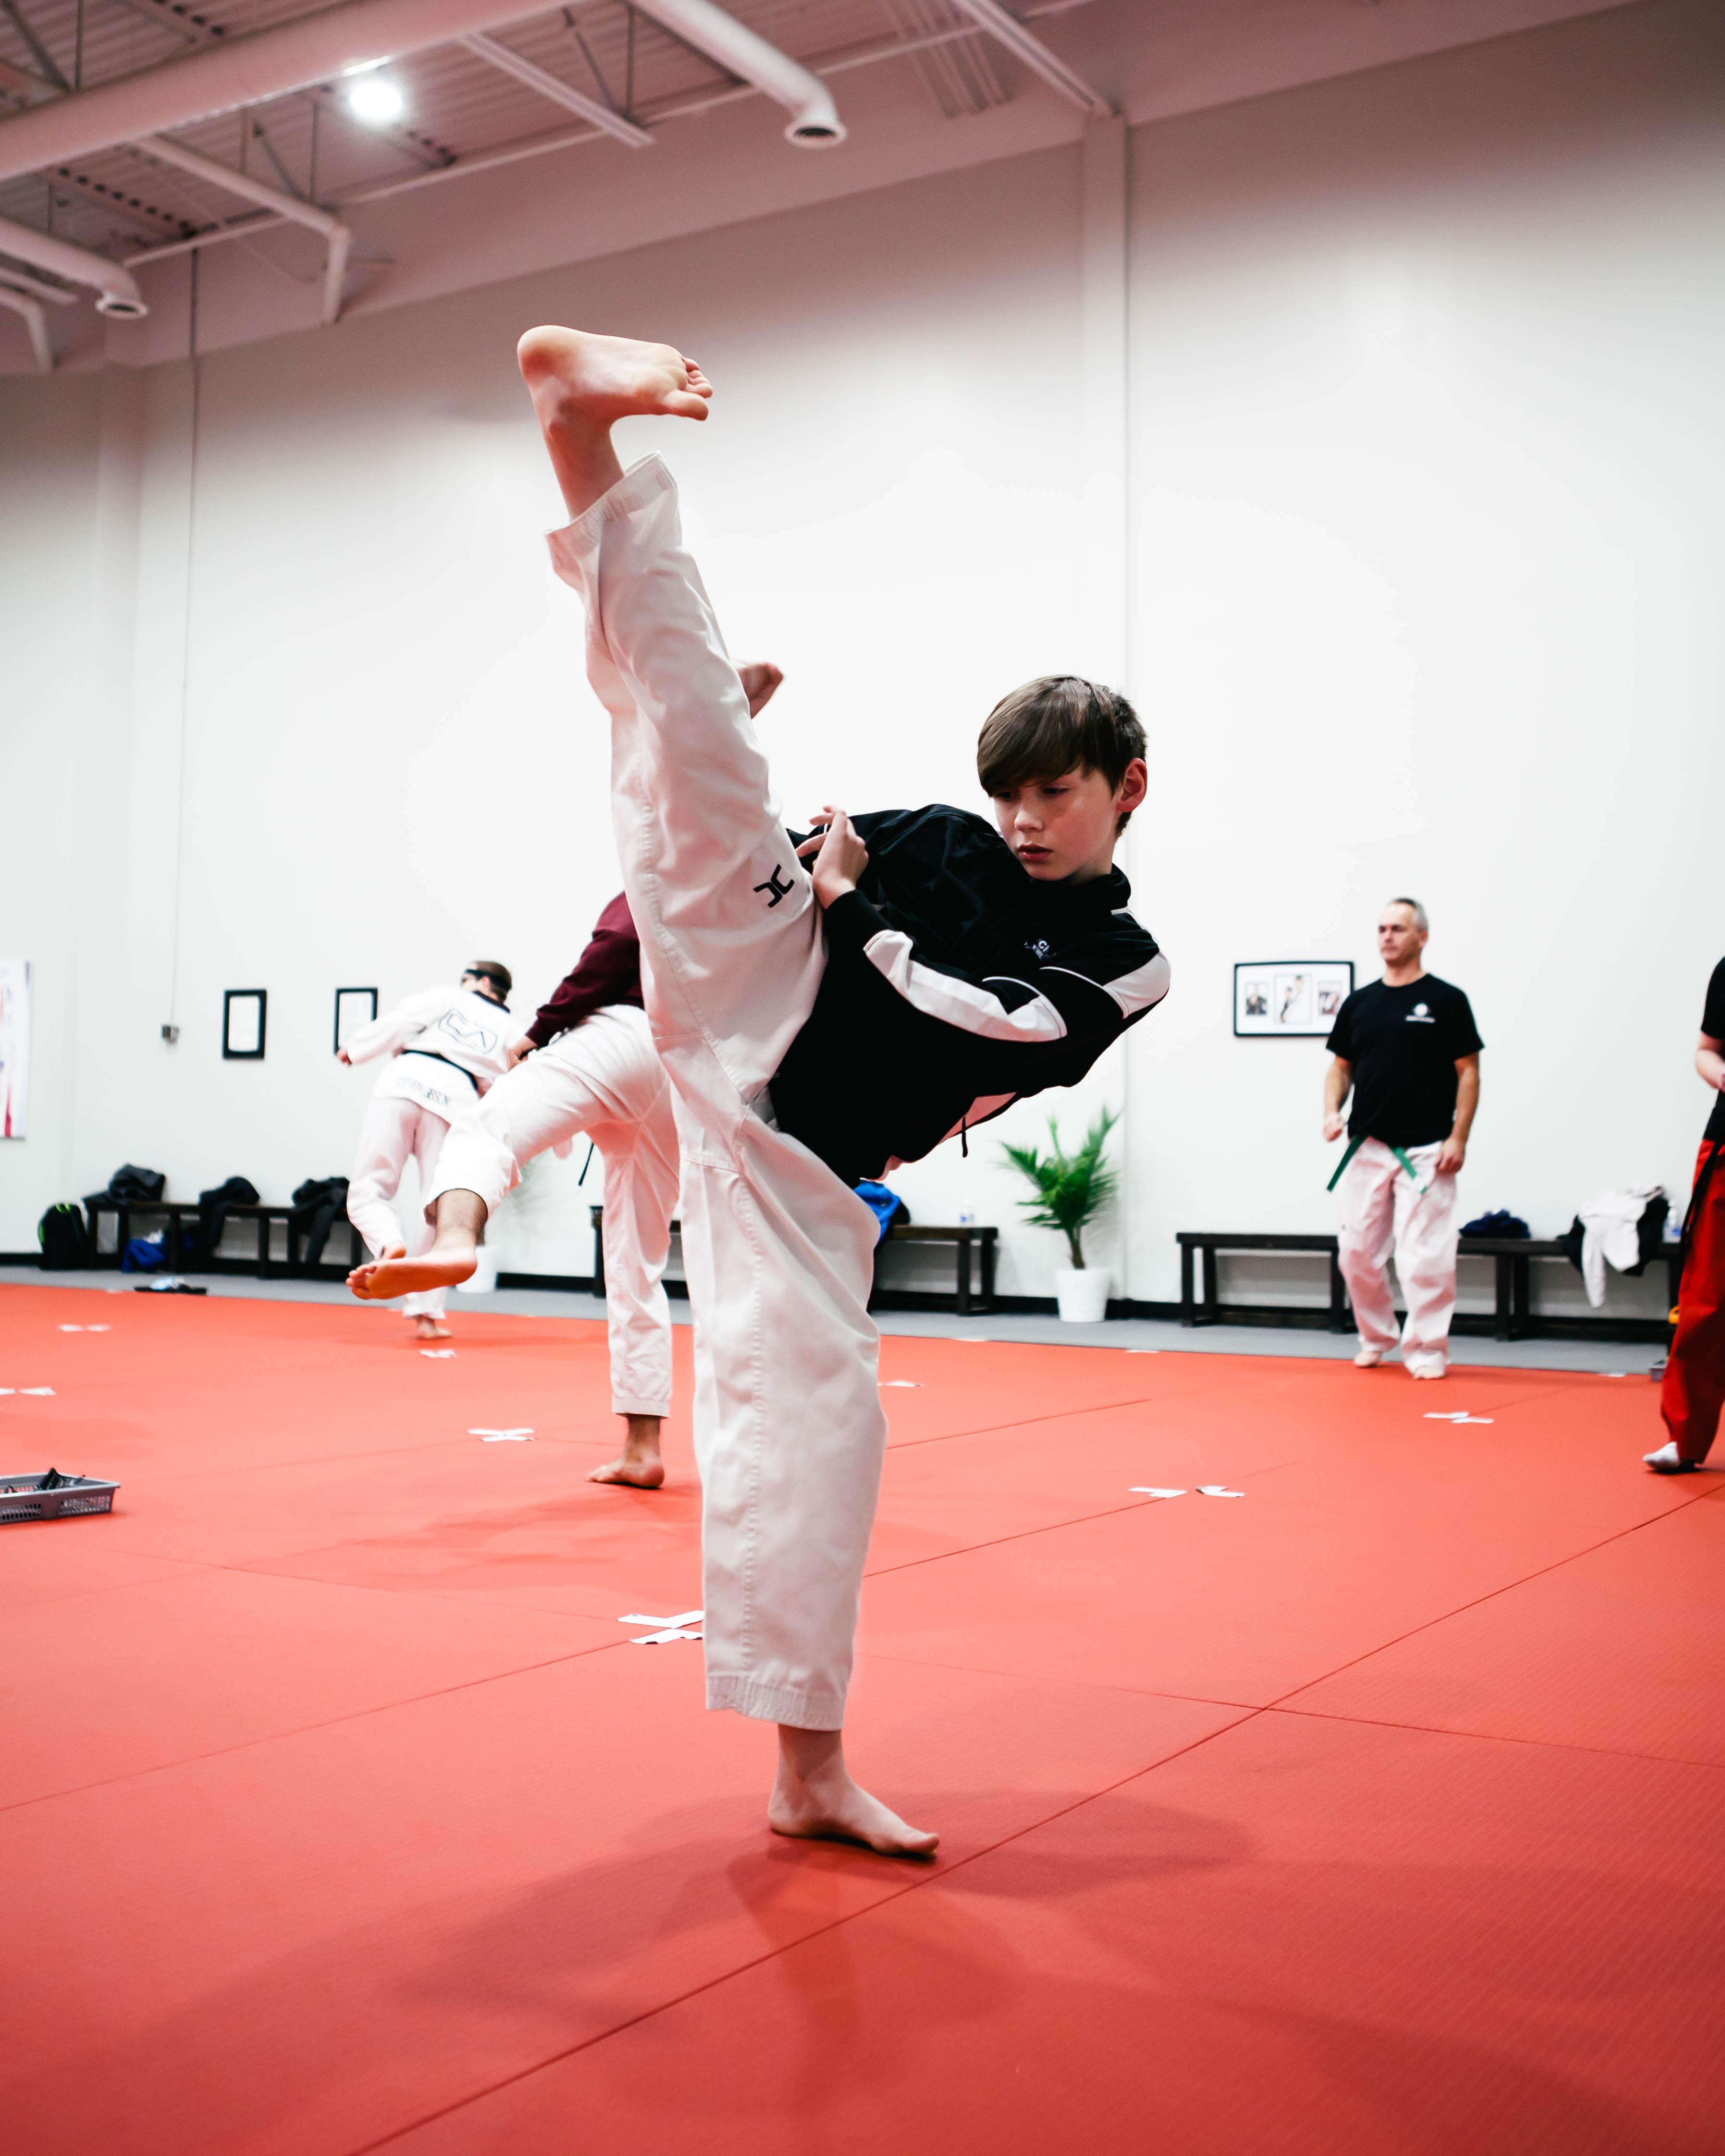 A kid learning Taekwondo